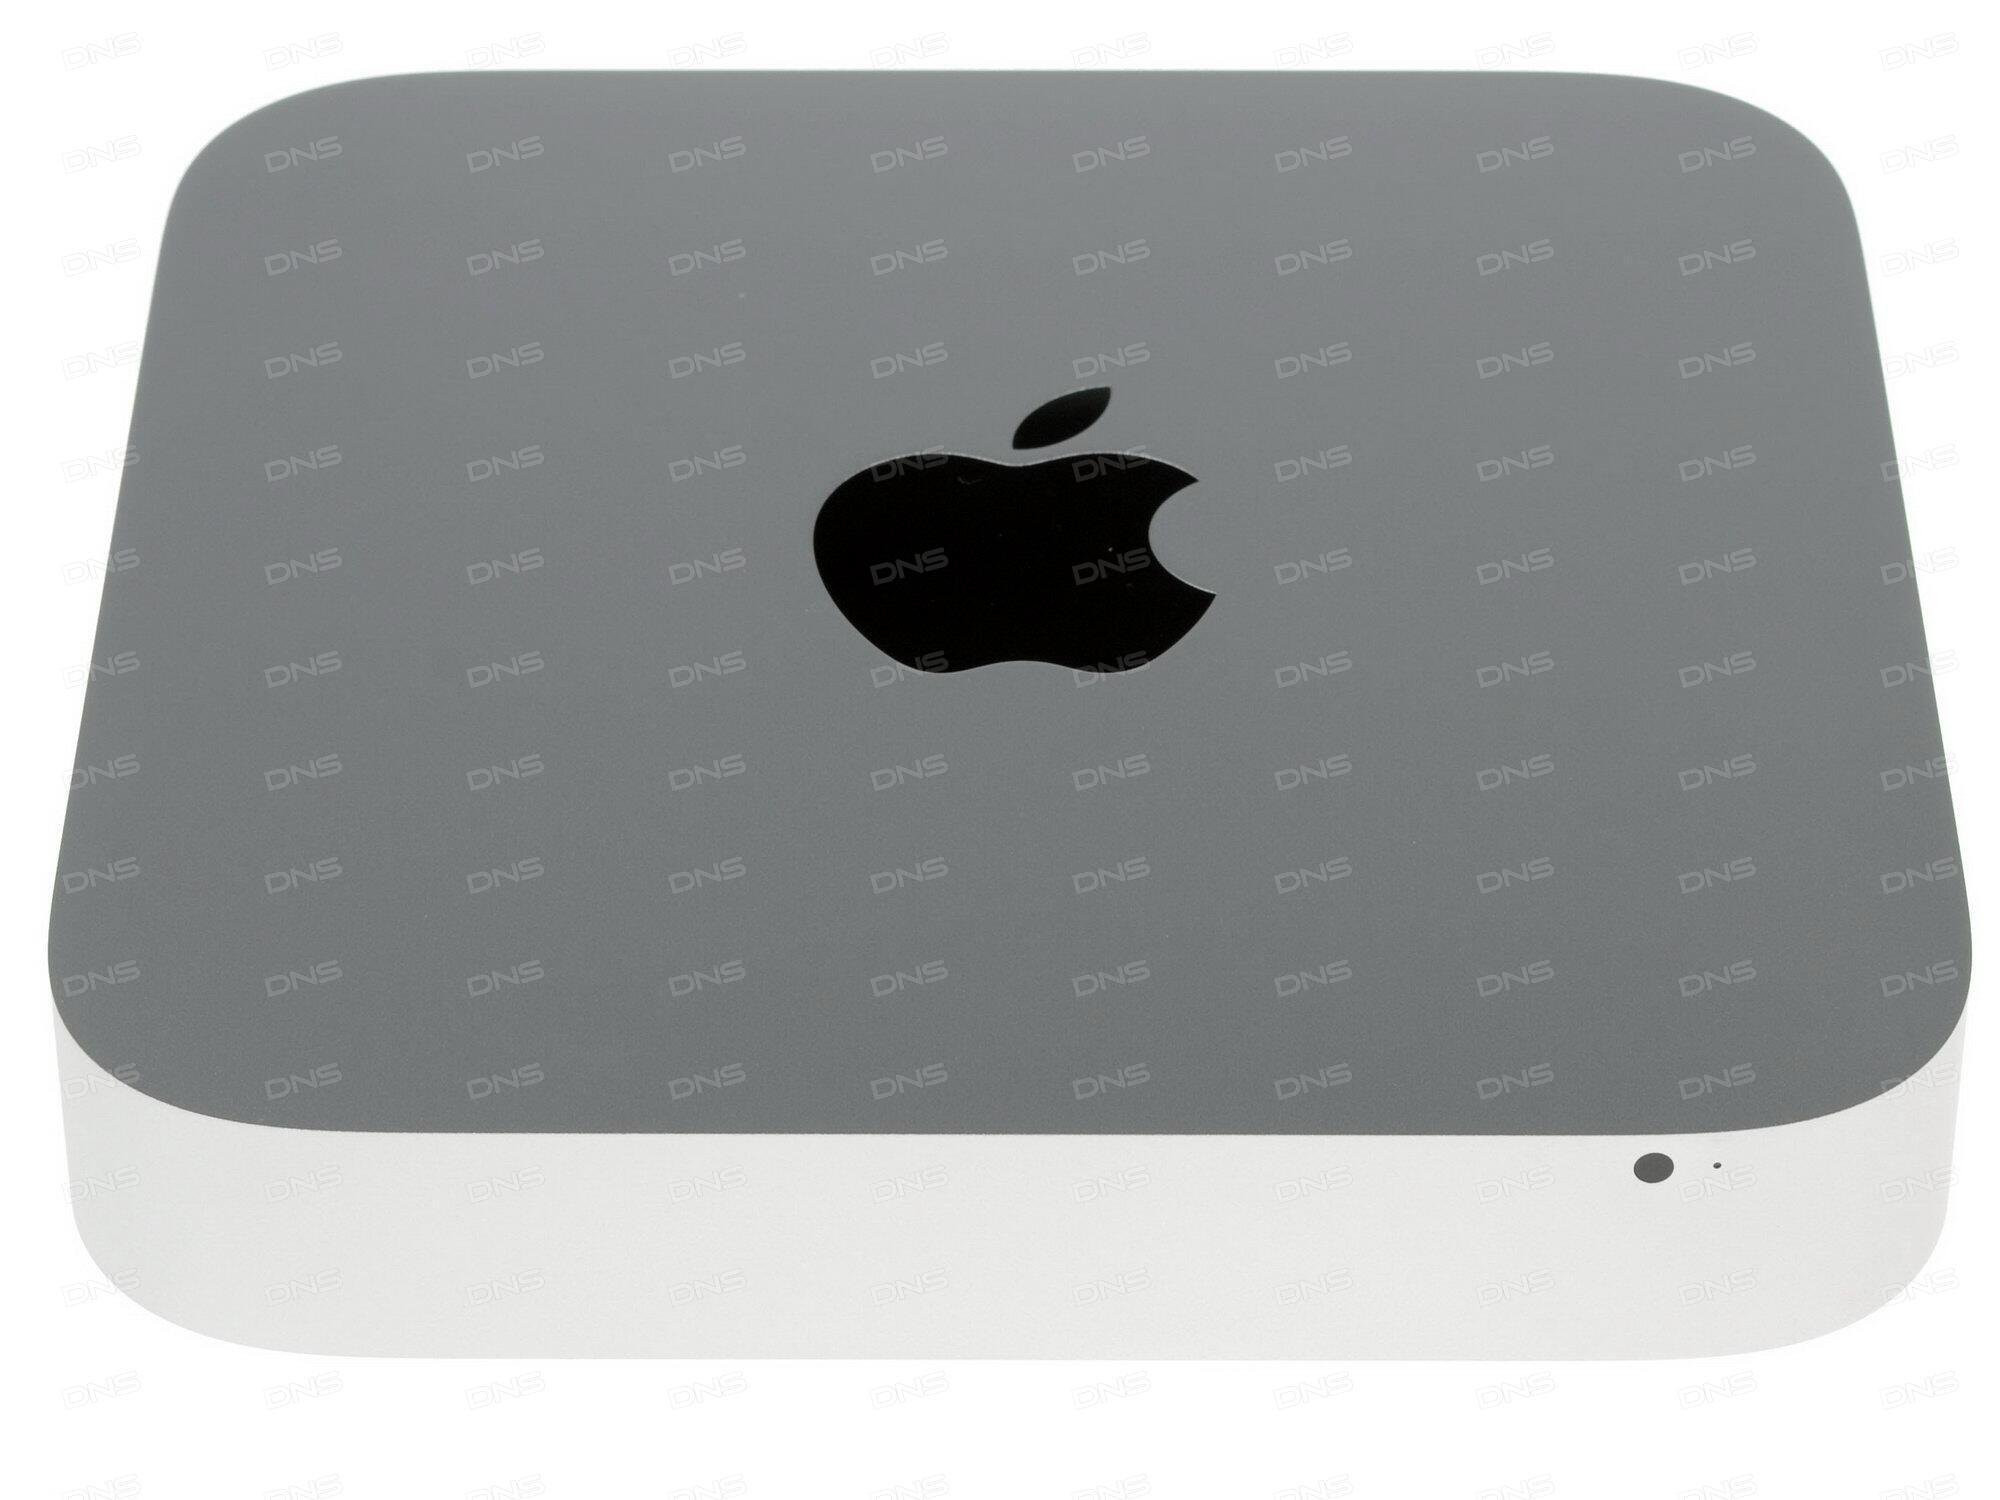 Неттоп APPLE Mac Mini MGEM2RU/A (Intel Core i5 1.4 GHz/4096Mb/500Gb/NO ODD/Intel HD Graphics 5000/Wi-Fi/Bluetooth/Mac OS X)